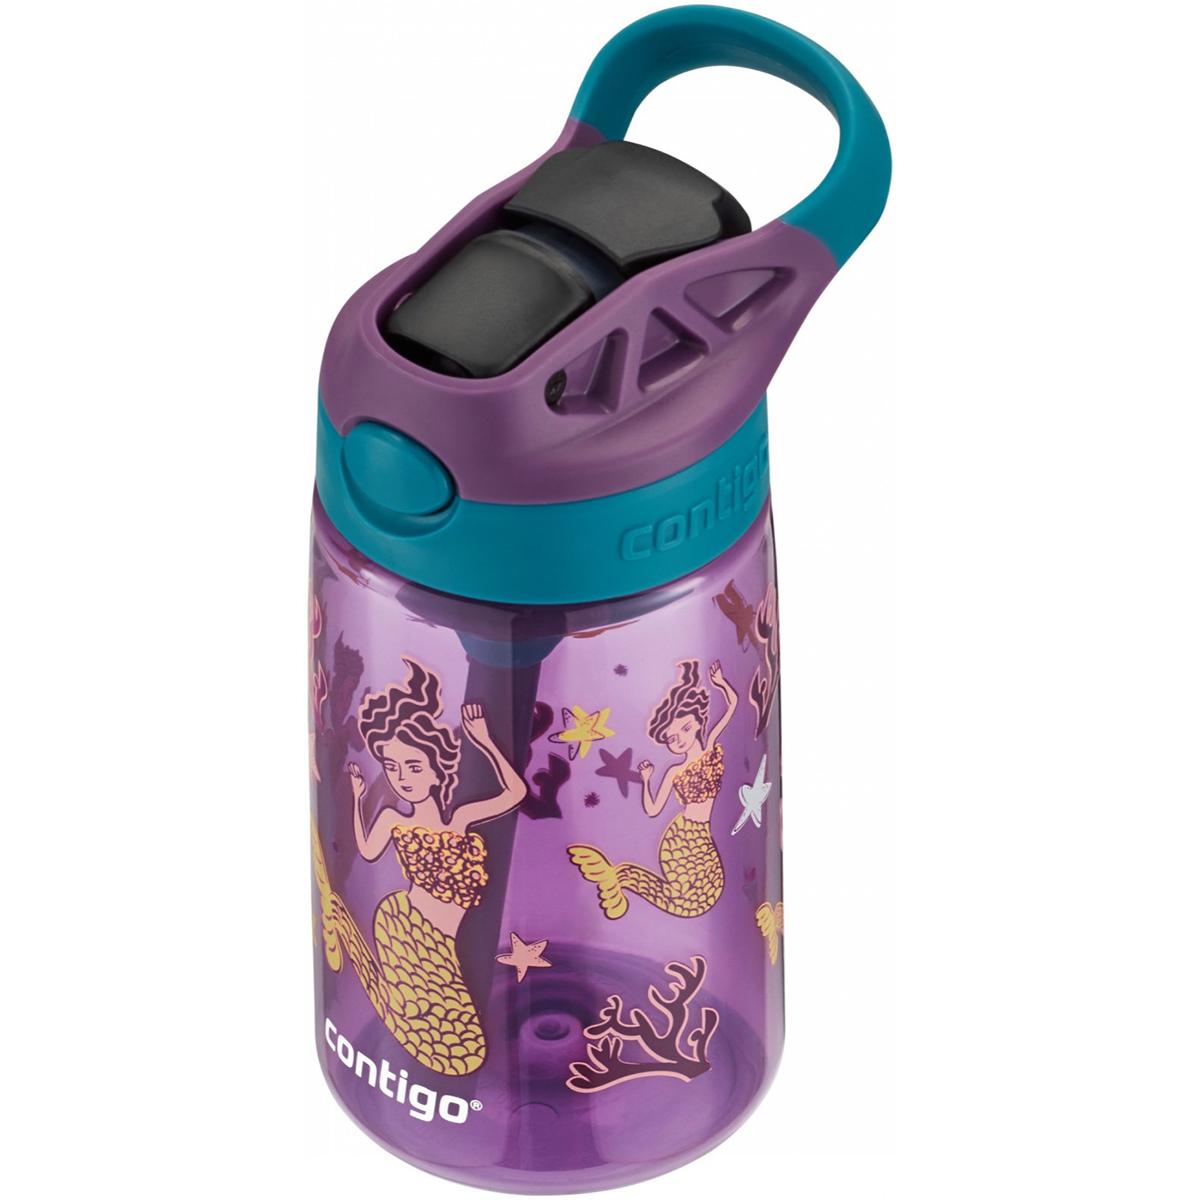 Contigo-Kid-039-s-14-oz-AutoSpout-Straw-Water-Bottle-with-Easy-Clean-Lid thumbnail 27